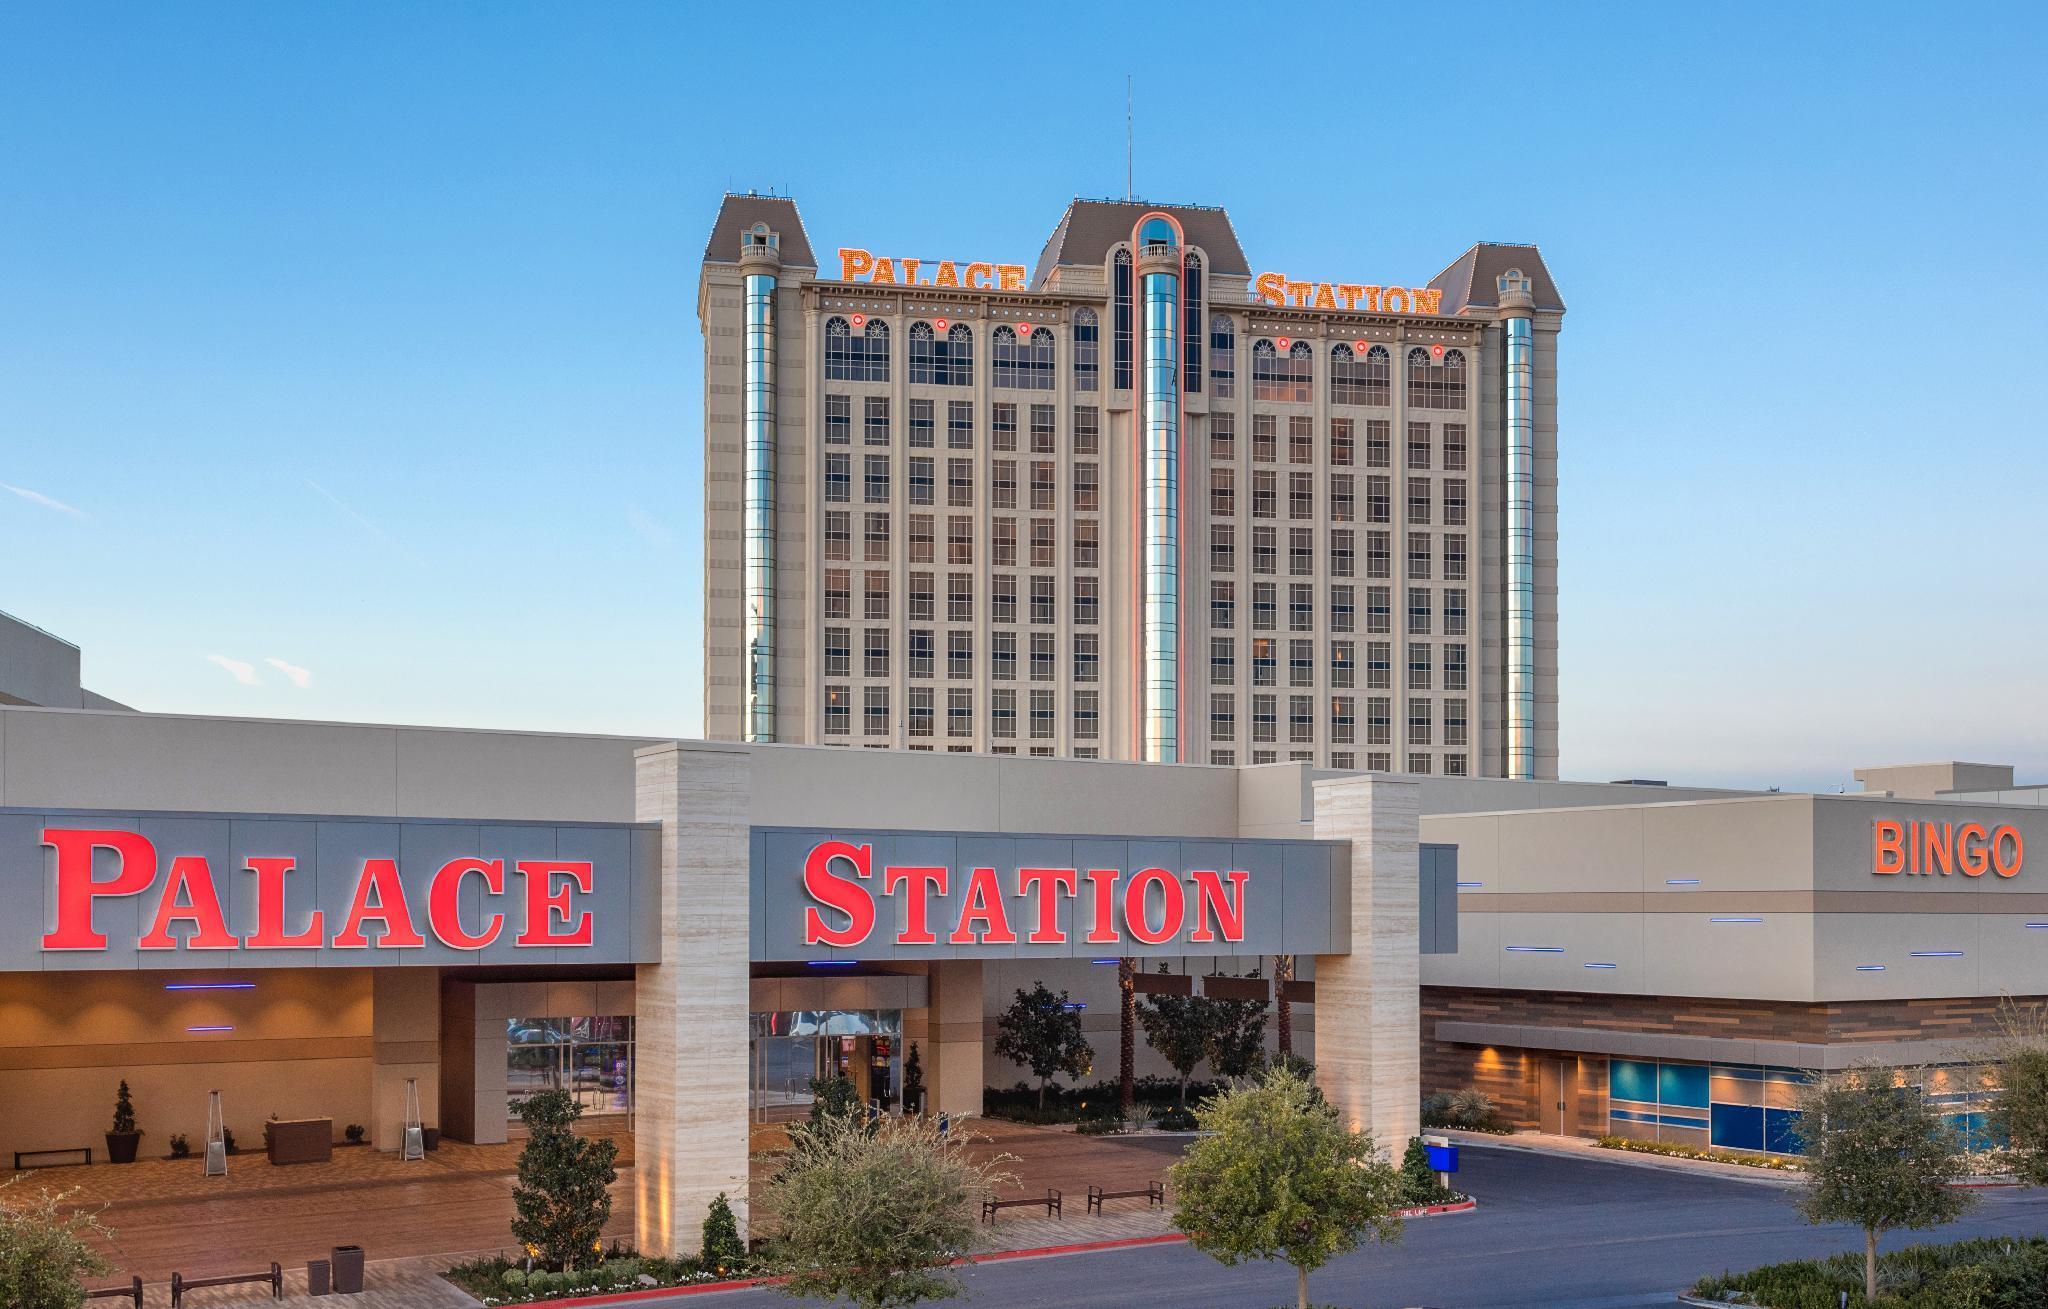 Palace Station Hotel and Casino